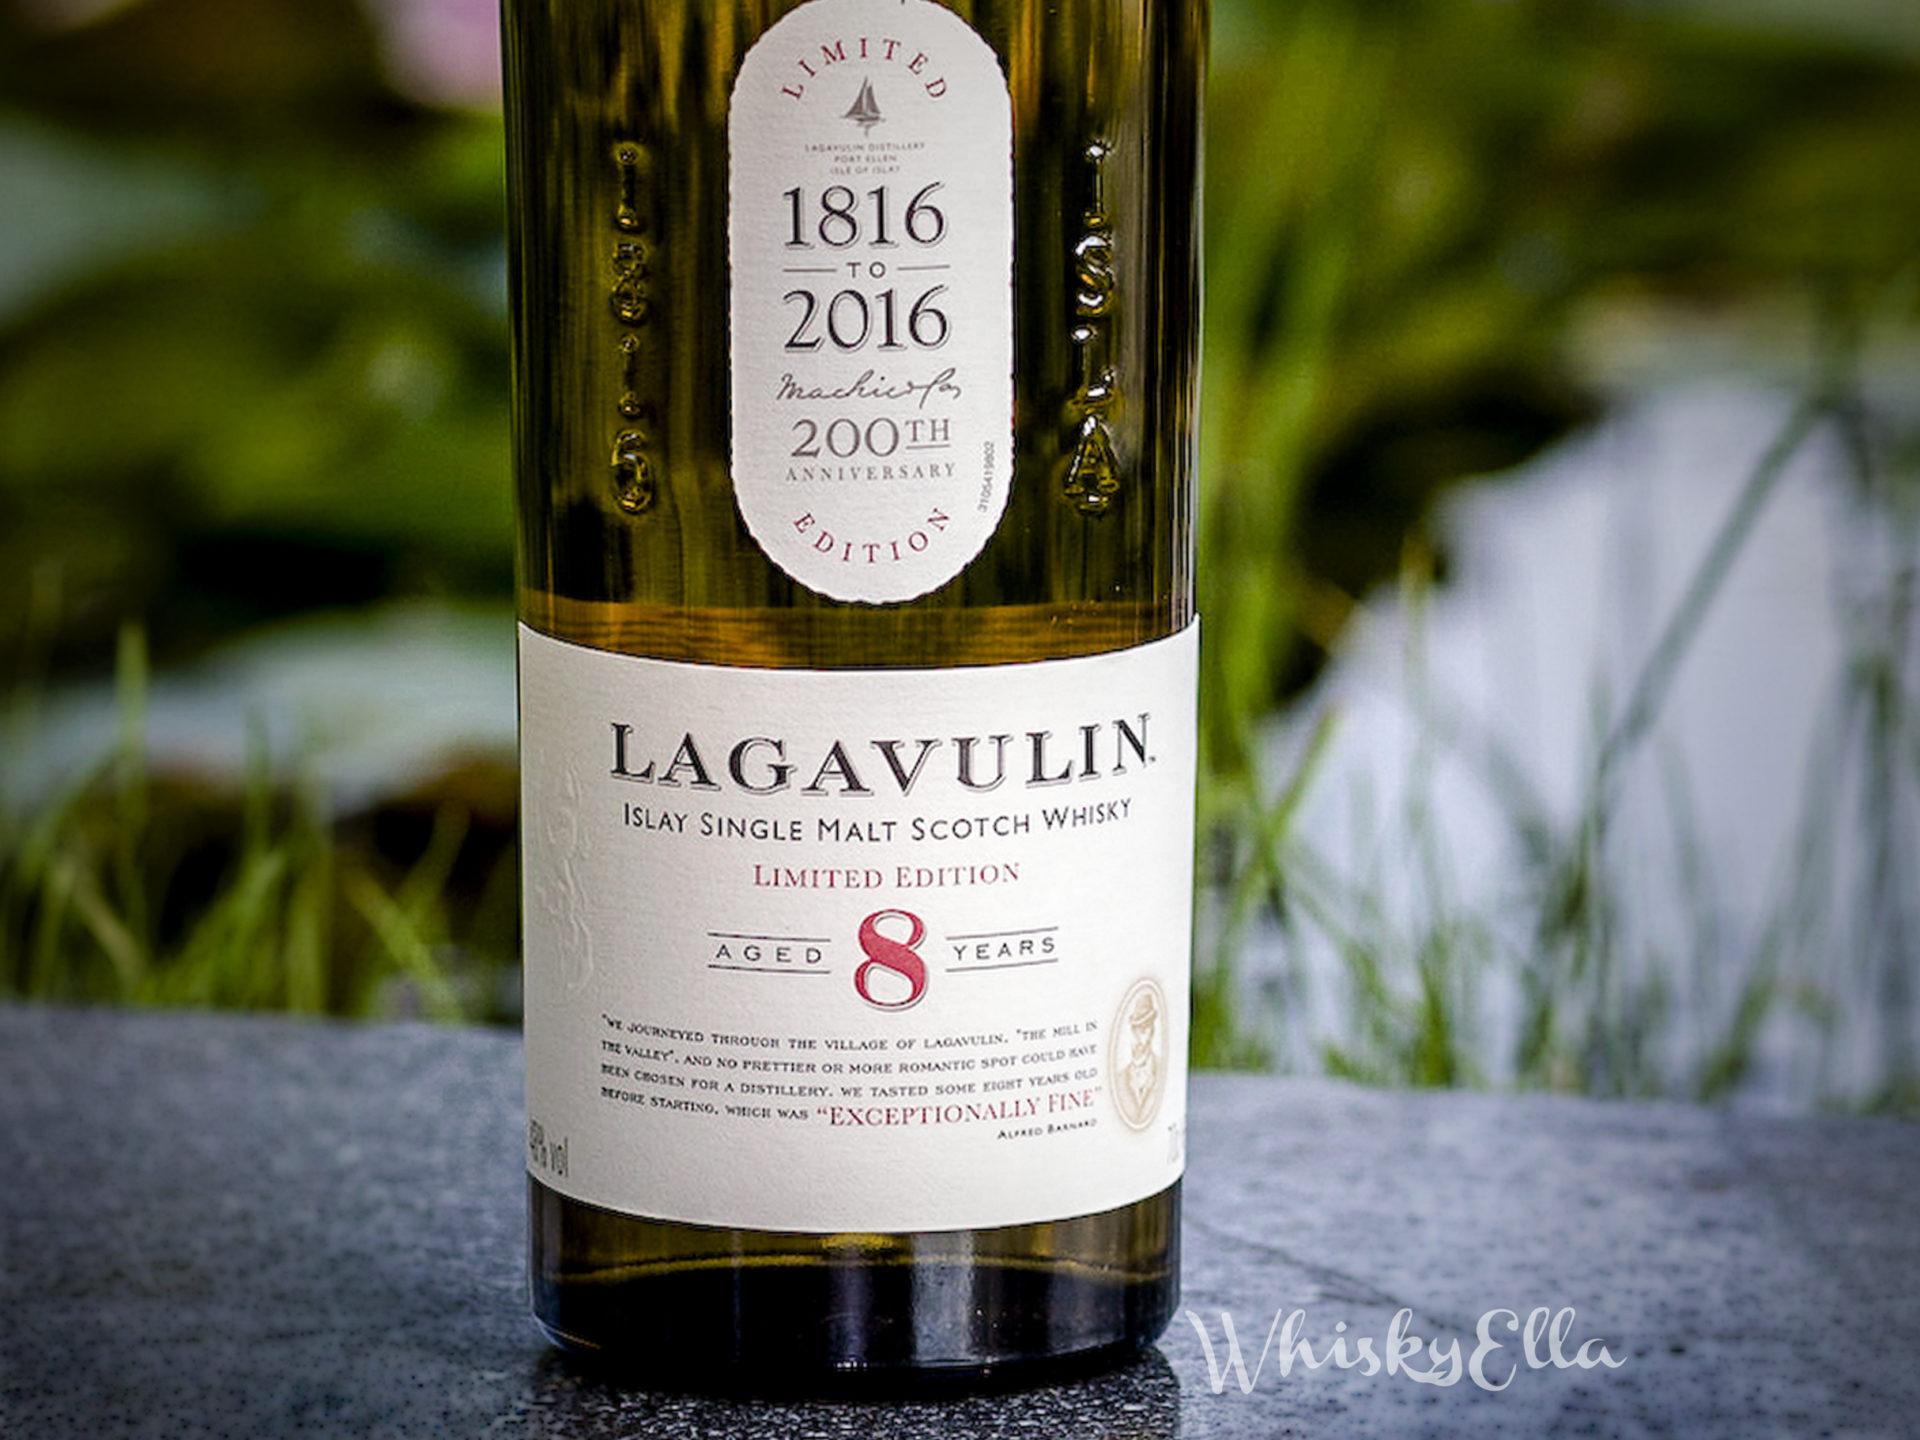 Nasza recenzja Lagavulin 8 yo 200 TH Anniversary #18